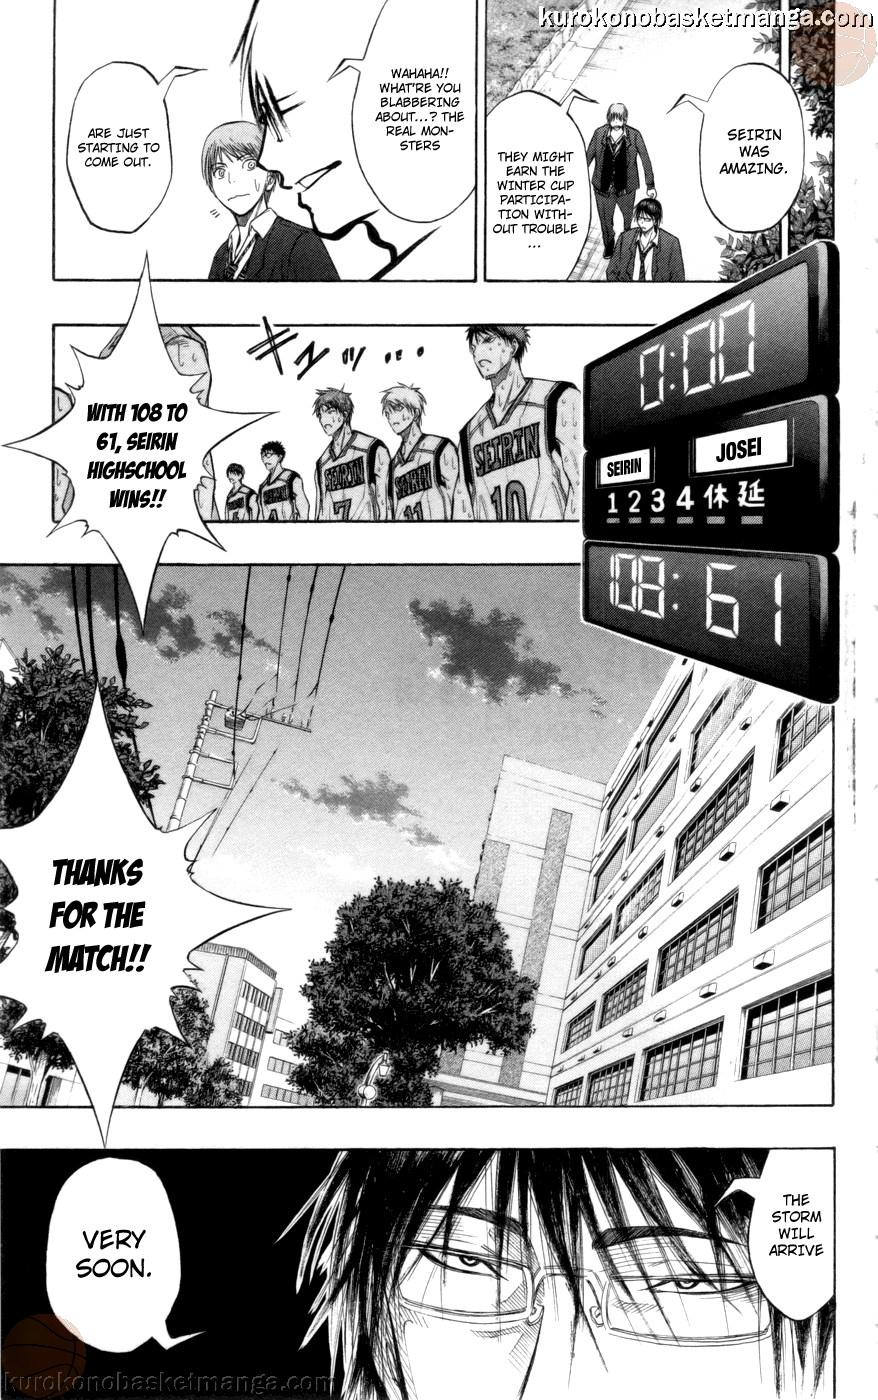 Kuroko no Basket Manga Chapter 83 - Image 19